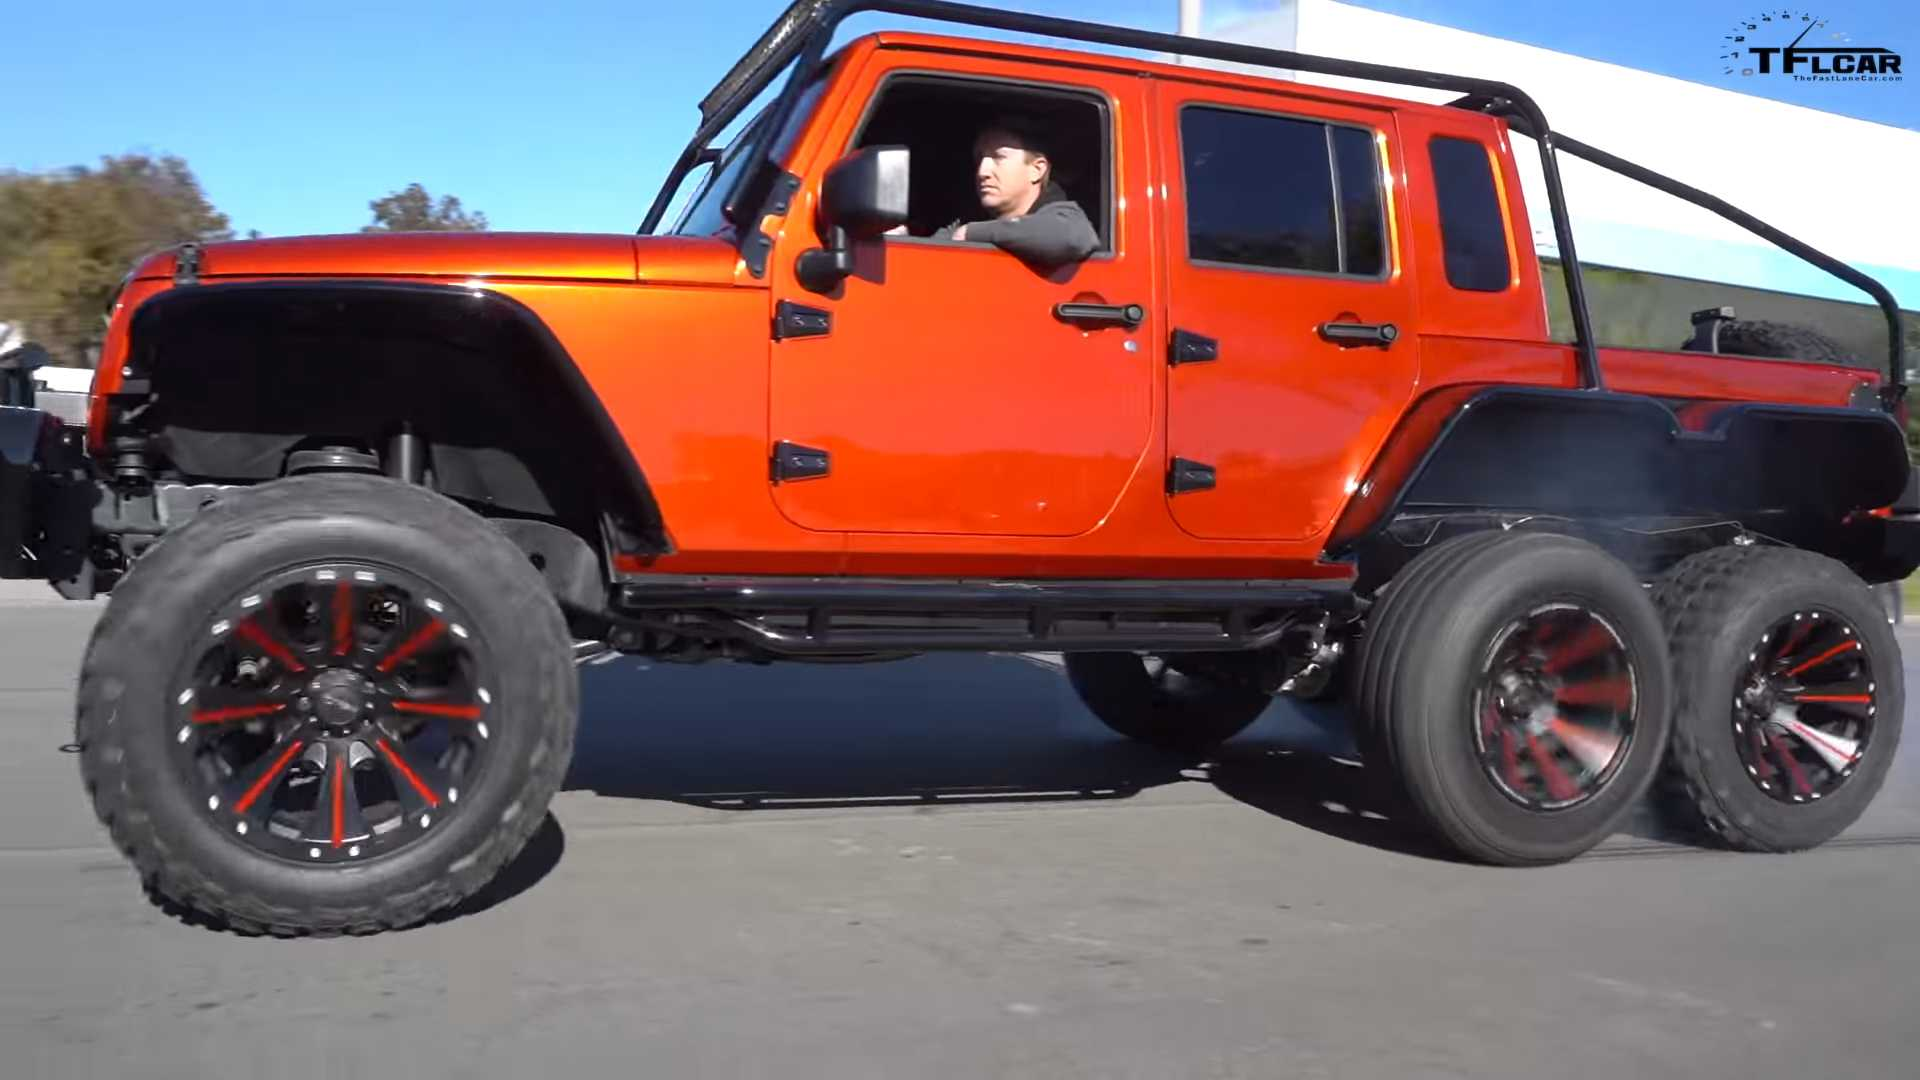 Crazy Custom Jeep Wrangler 6x6 Pickup Packs Hellcat V8 Power